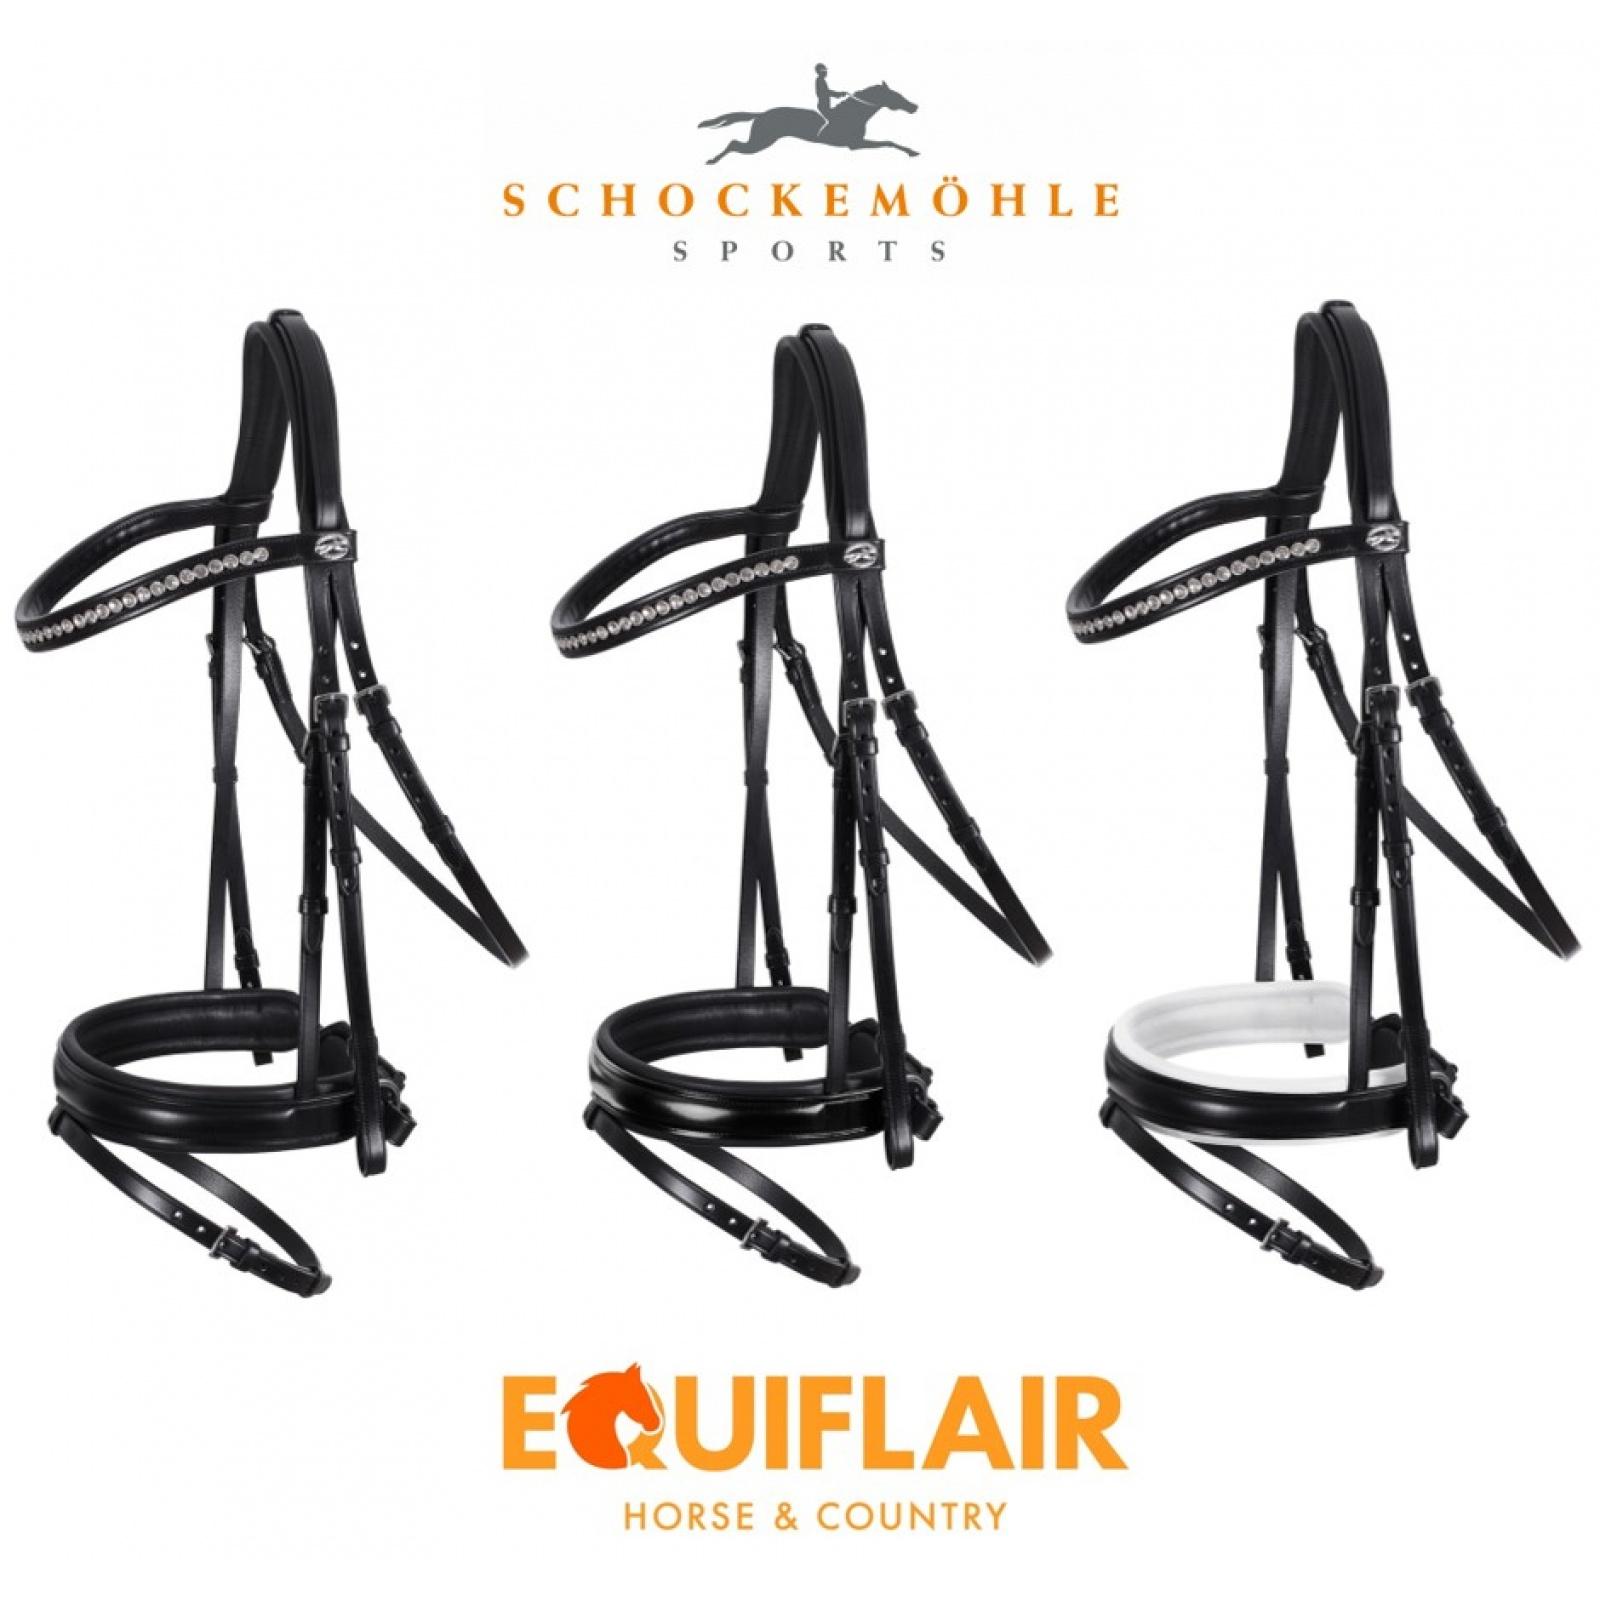 Schockemohle-Madrid-Classic-Line-Flash-Bridle miniature 6